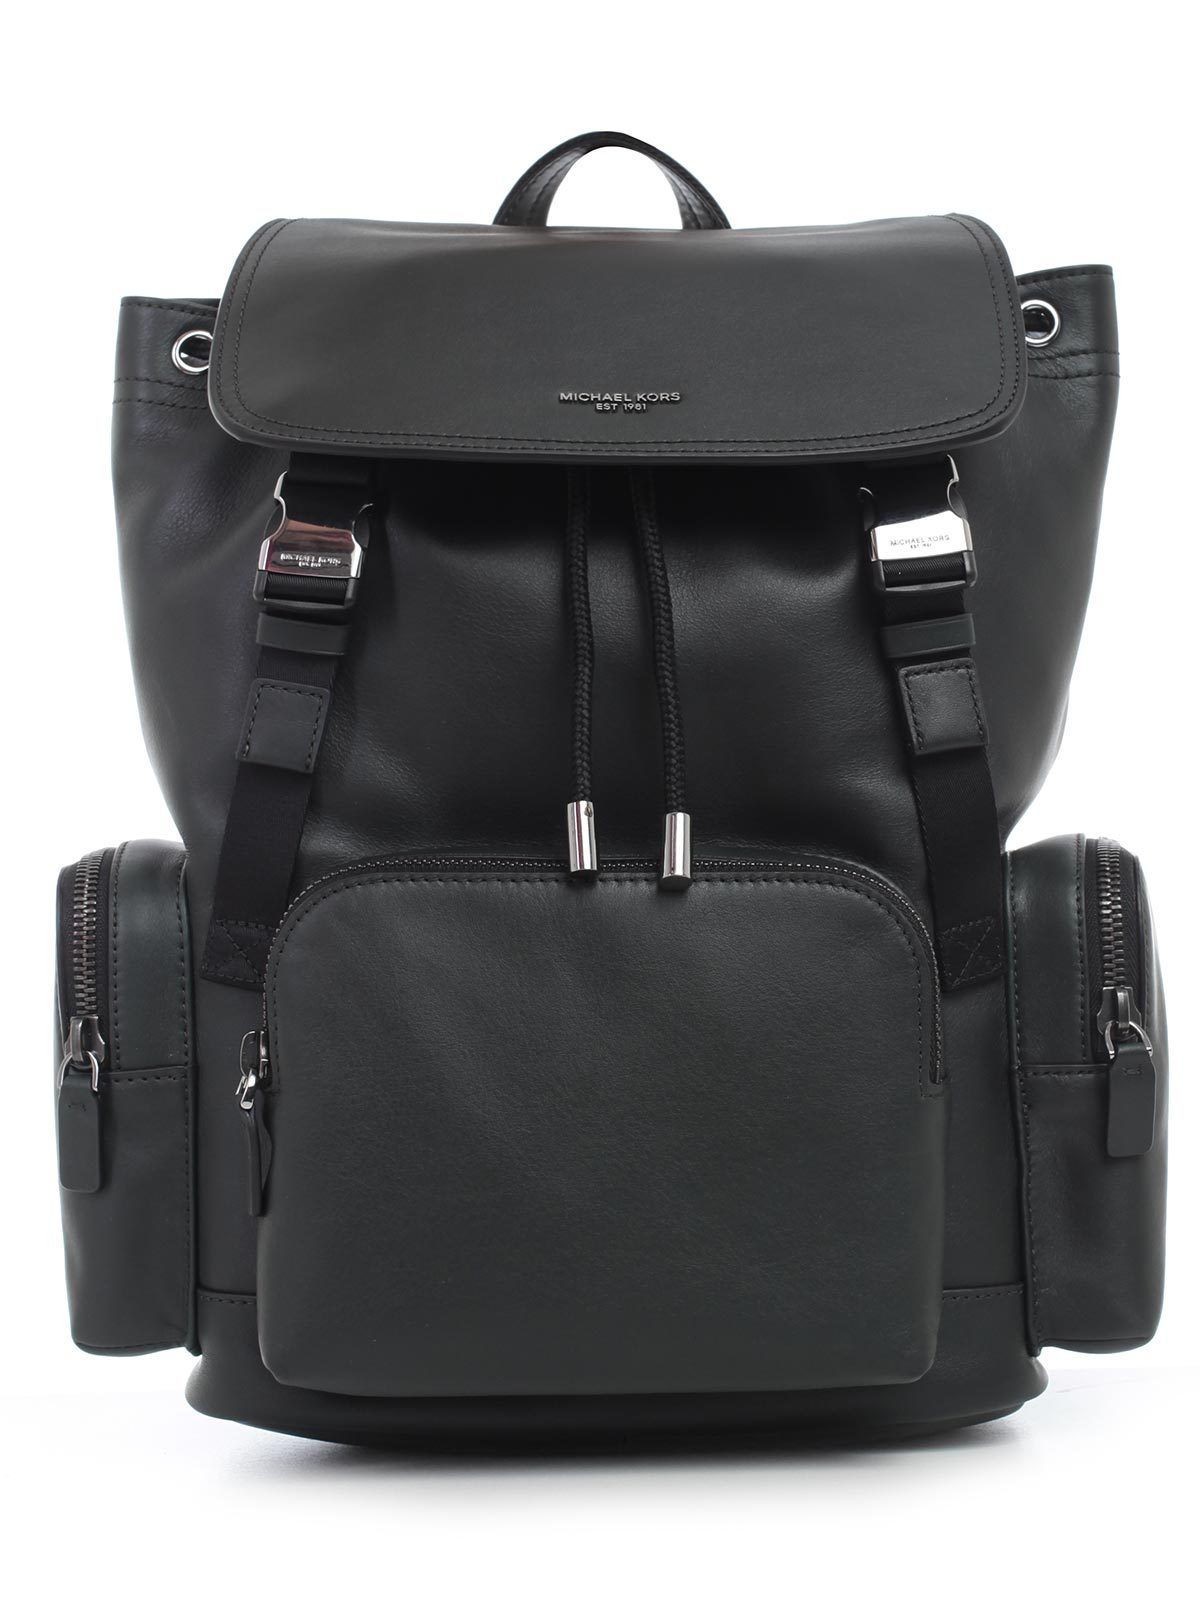 86f4a66a04a2 MICHAEL KORS MICHAEL KORS HENRY CLASSIC FLAP BACKPACK. #michaelkors #bags # leather #backpacks